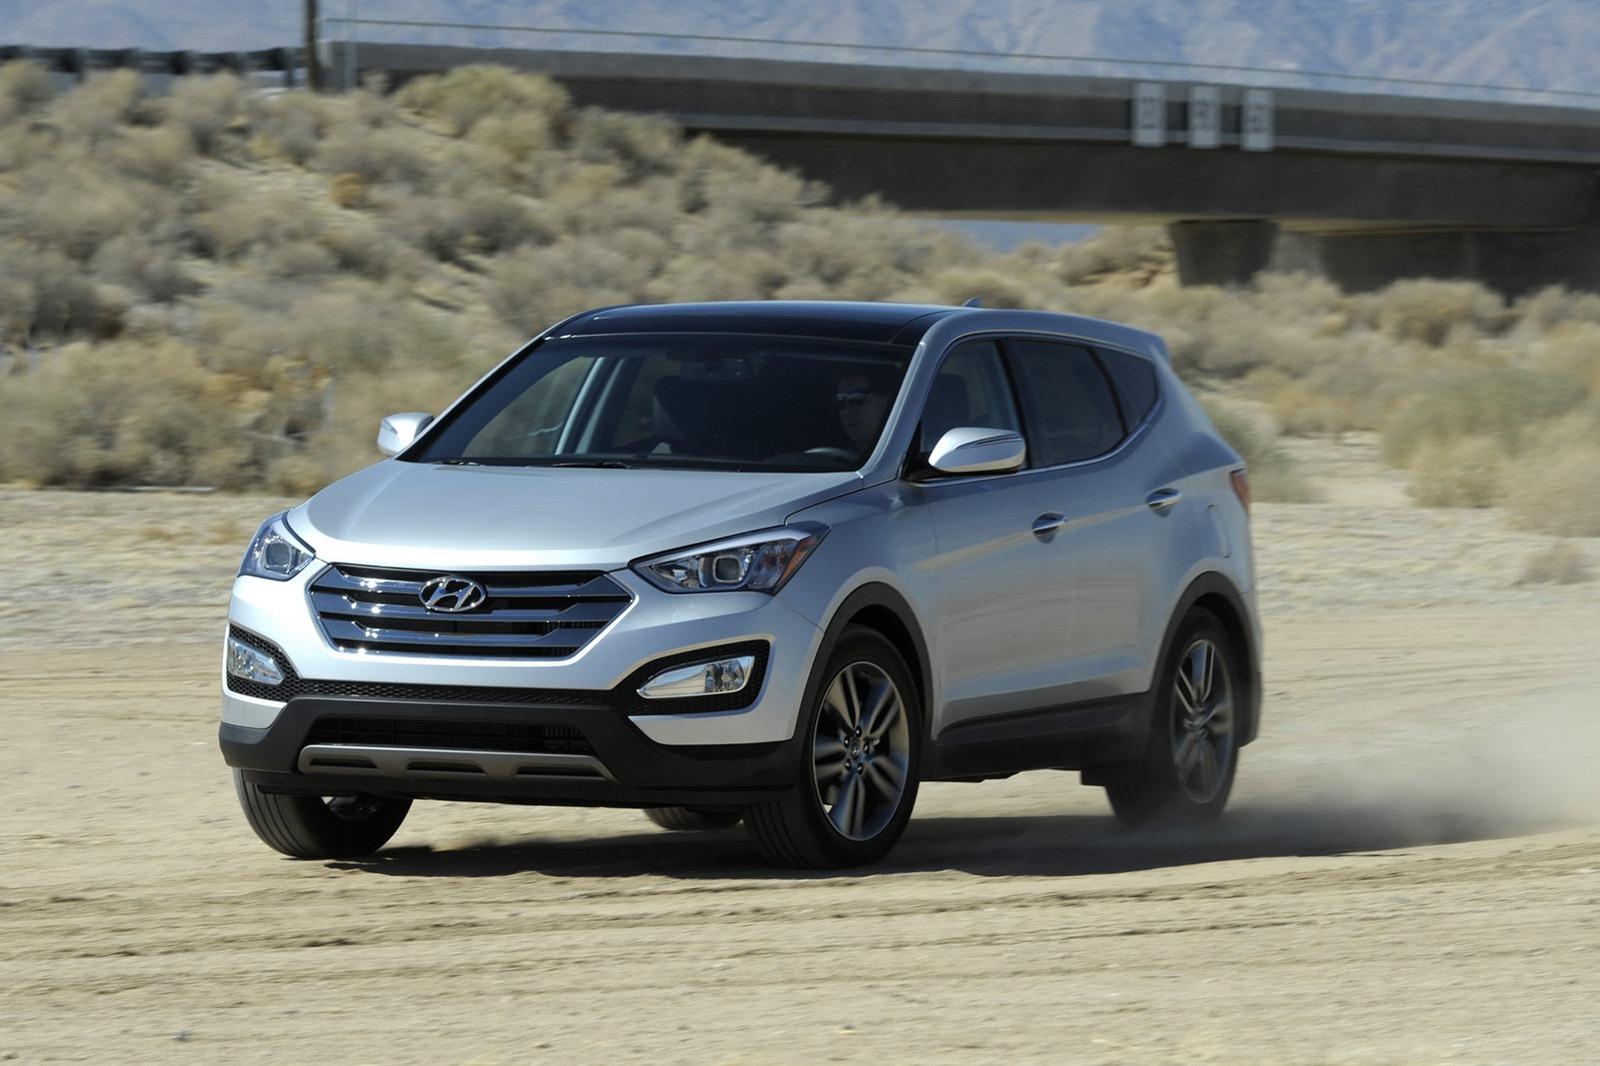 Hyundai To Launch Santa Fe 2013 Edition